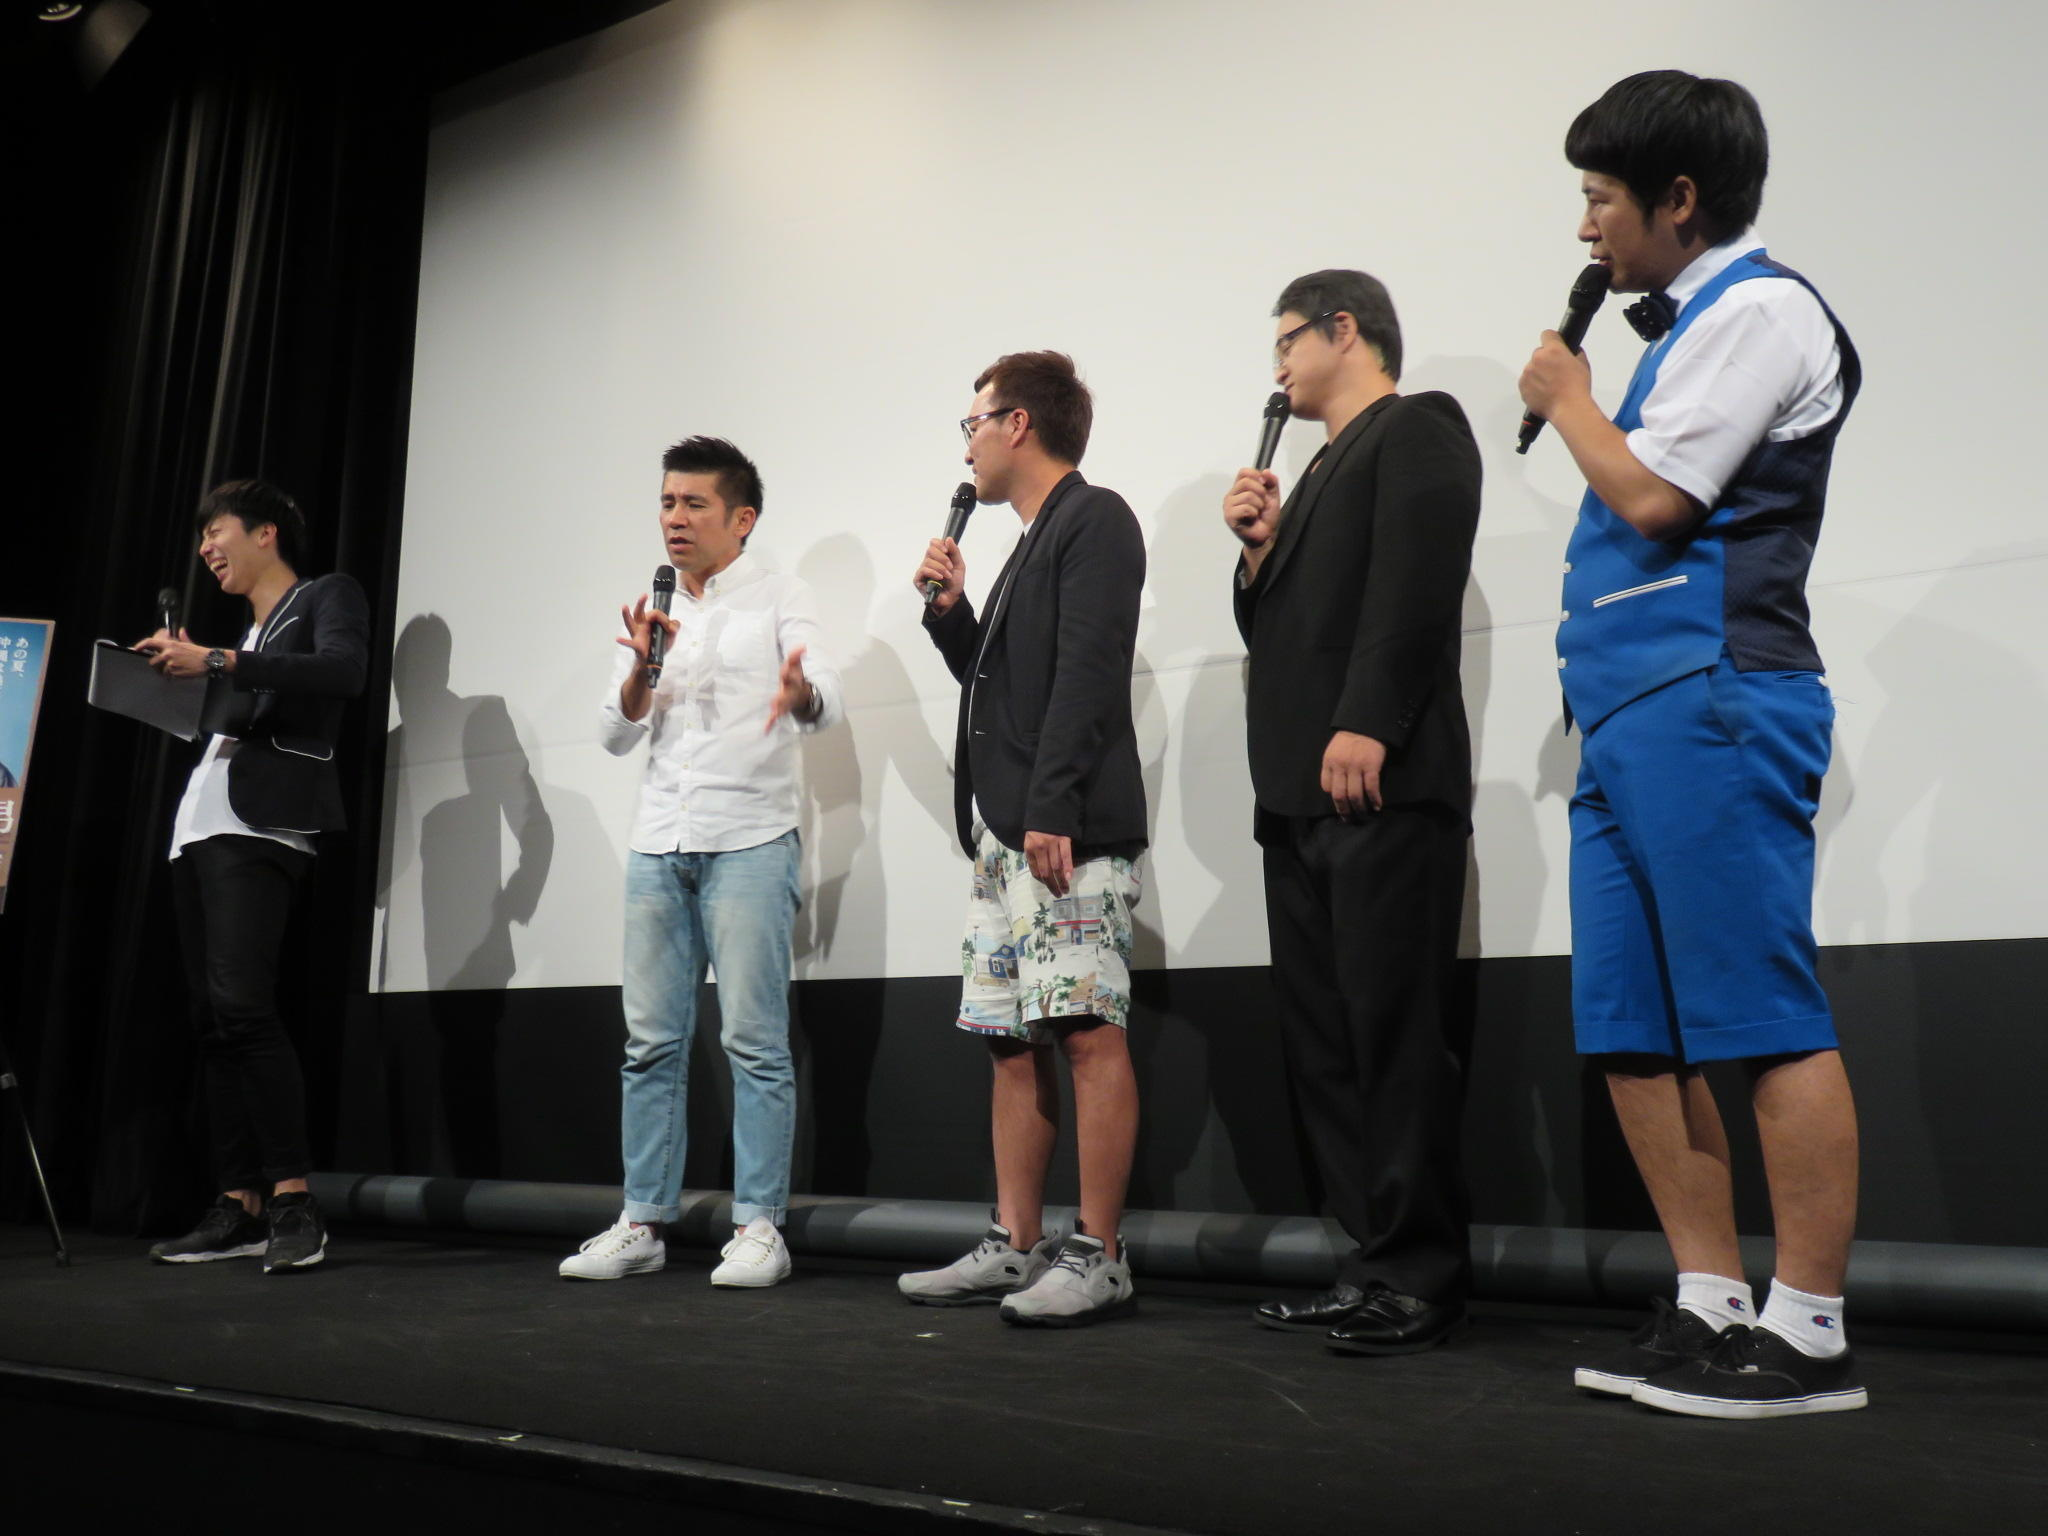 http://news.yoshimoto.co.jp/20170728223509-0dd44d2532b22d015e35c12b4d5695e352370a66.jpg